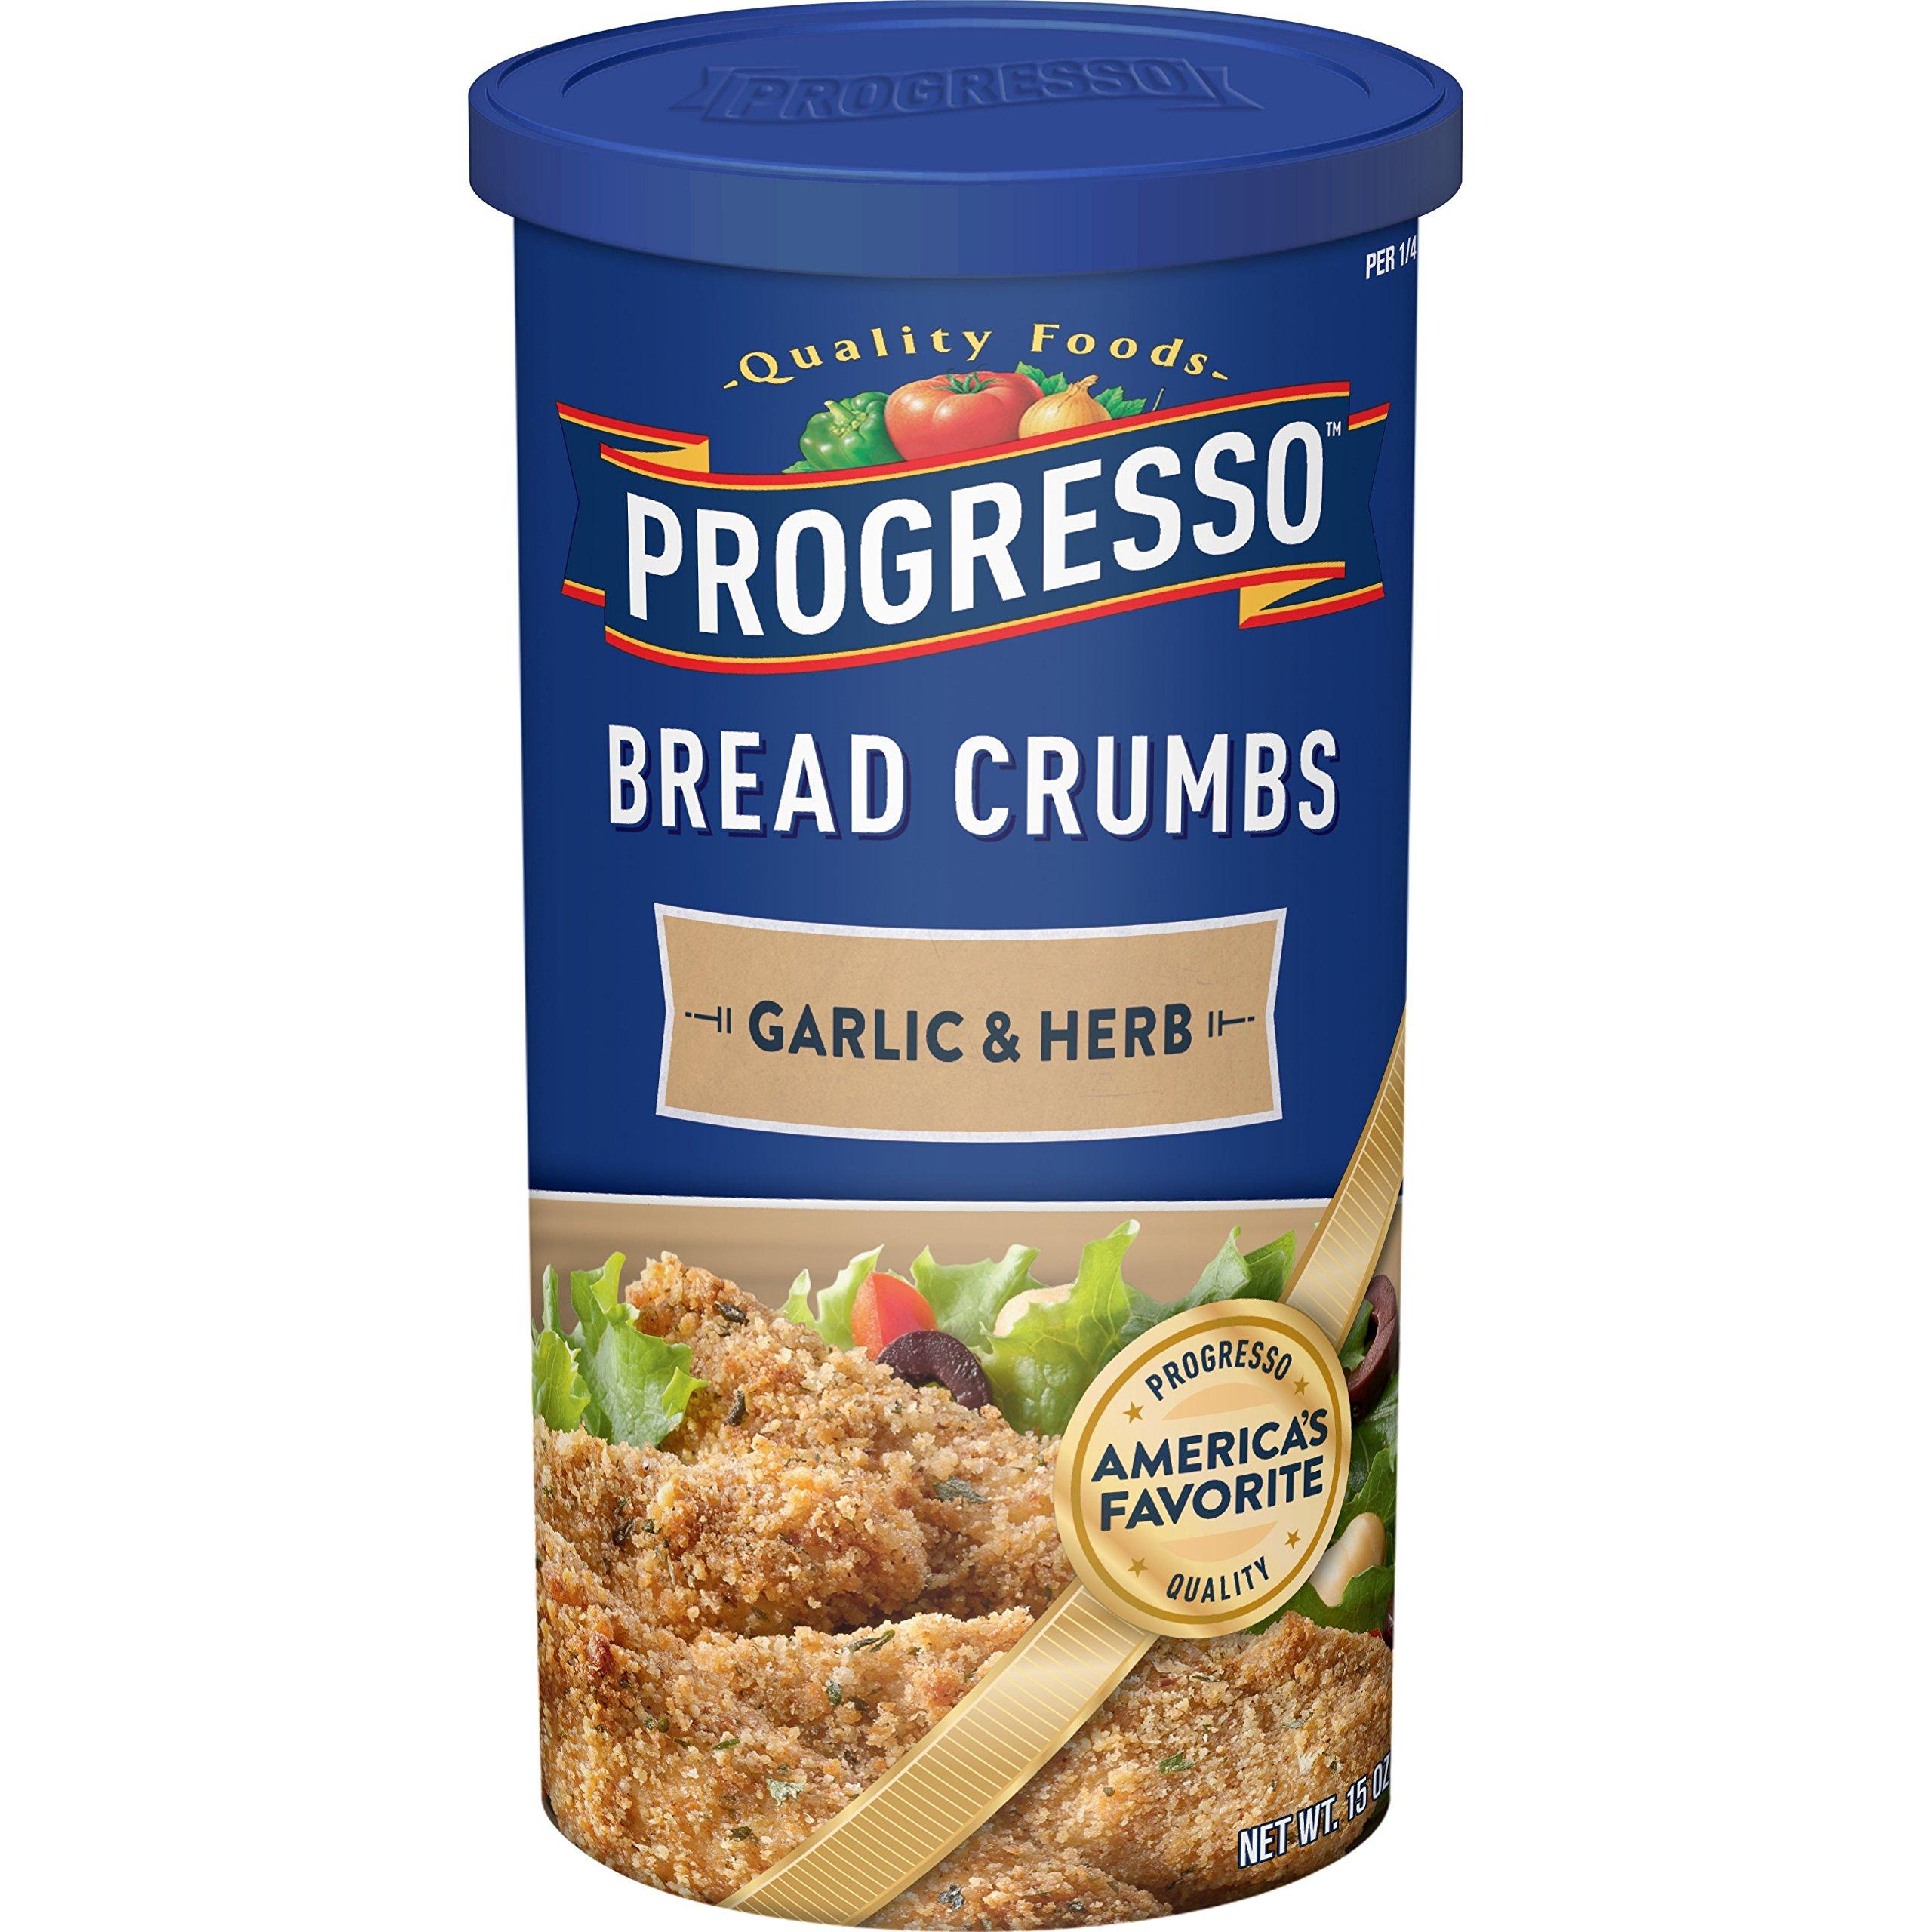 Progresso Garlic & Herb Bread Crumbs 15 oz. Canister